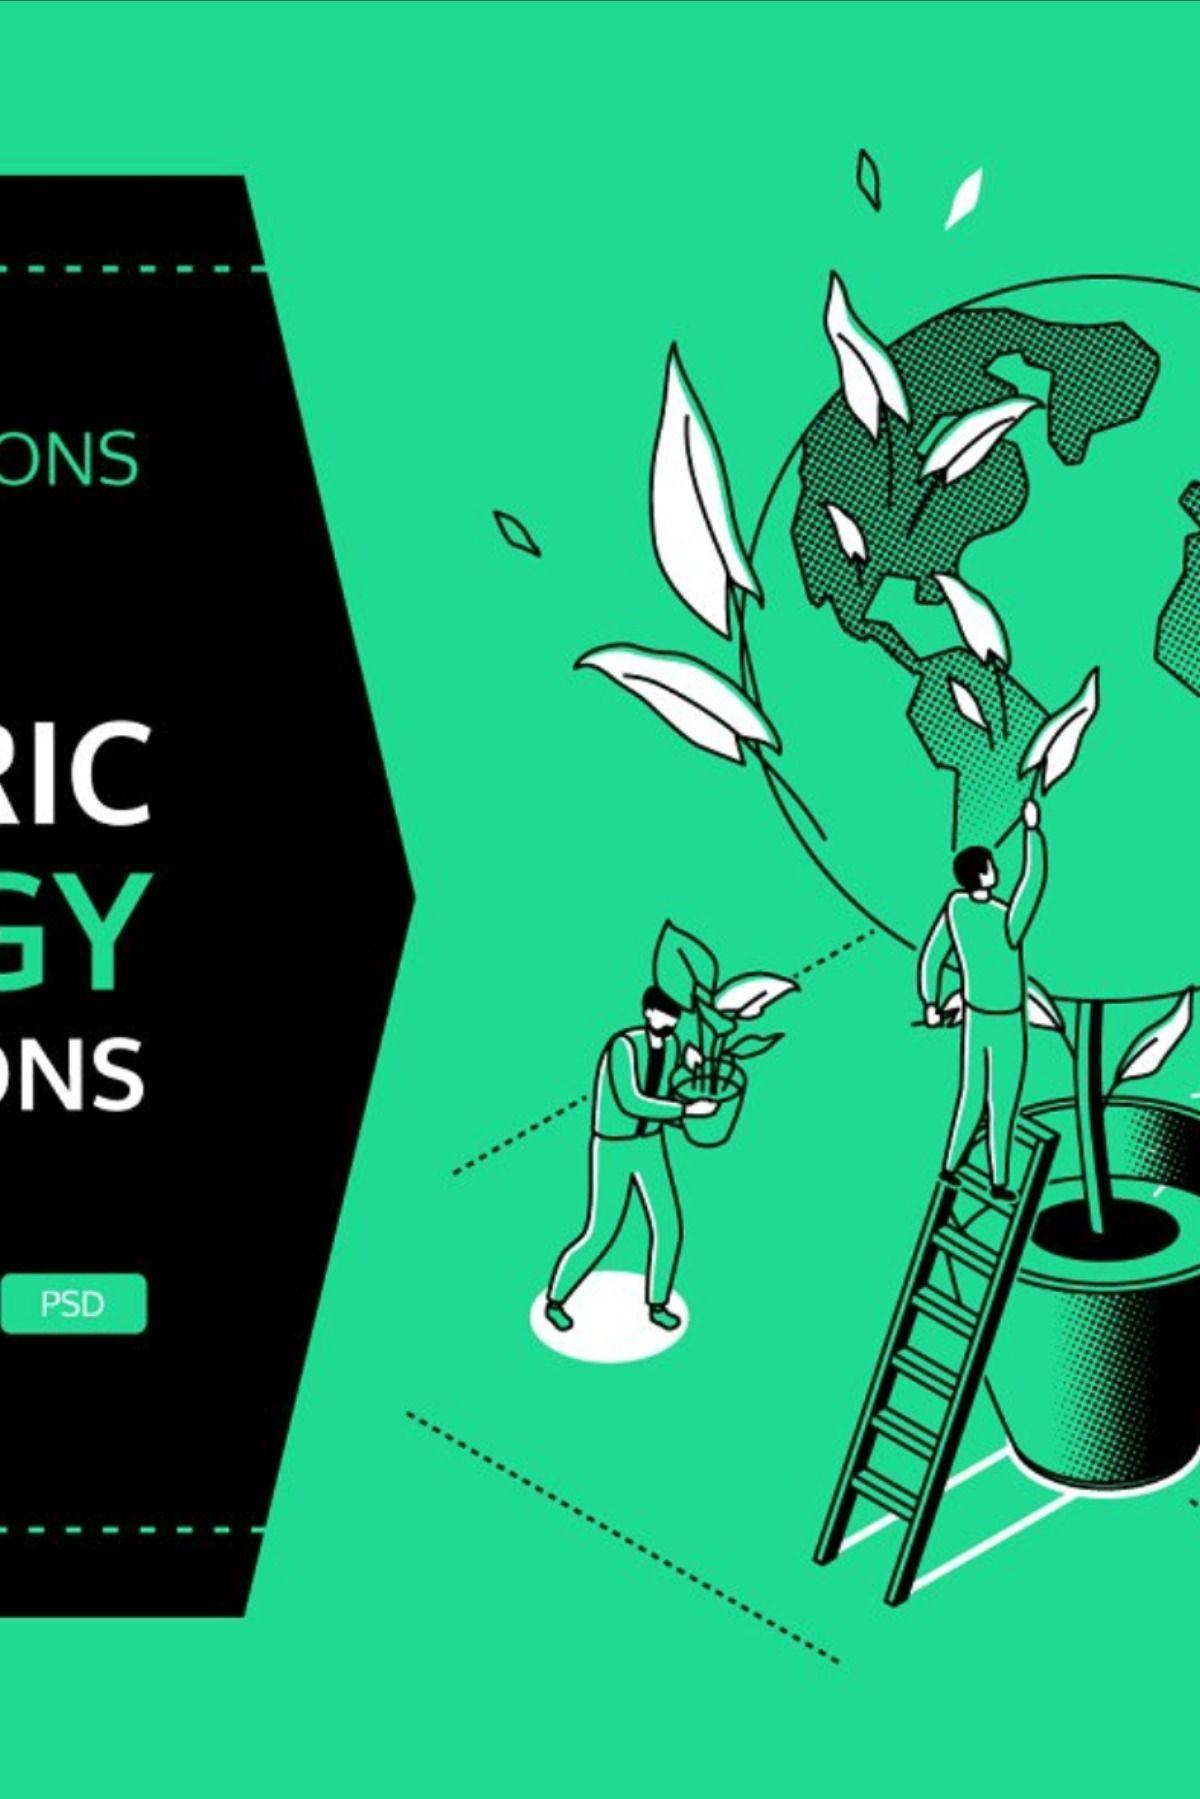 Ecology Line Isometric Illustrations in 2020 Isometric